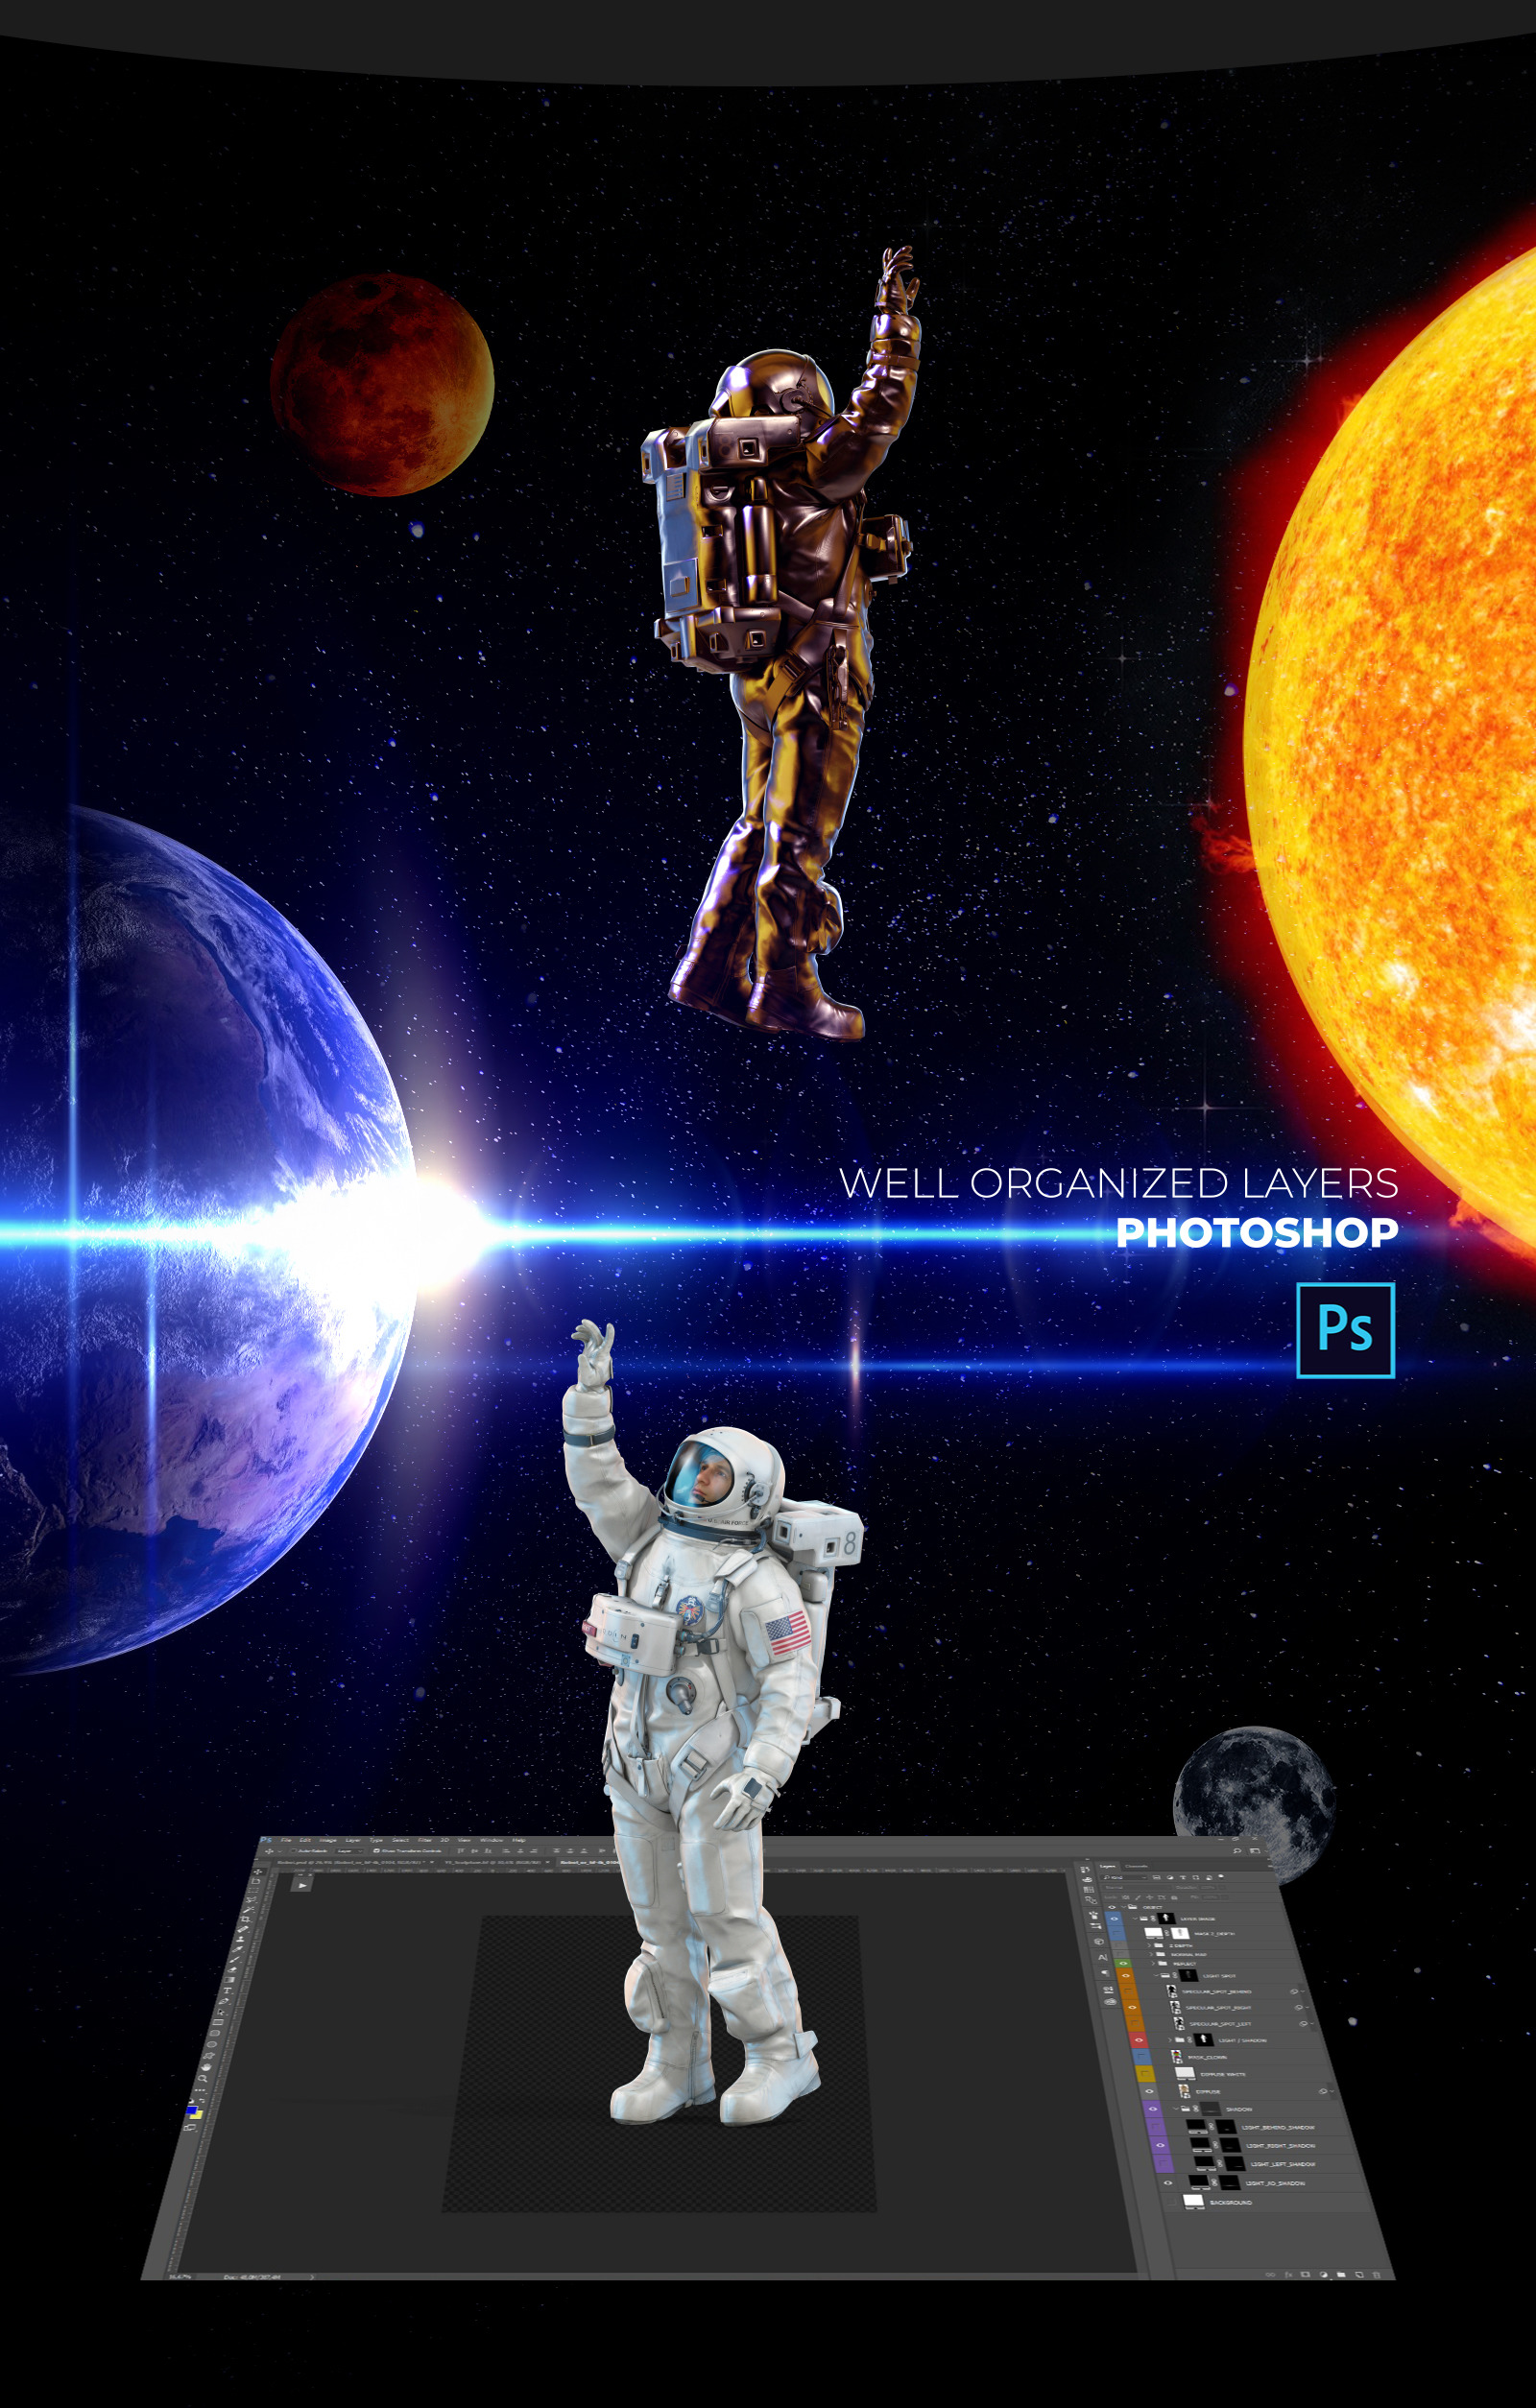 3D Mockup Space Astronaut #16